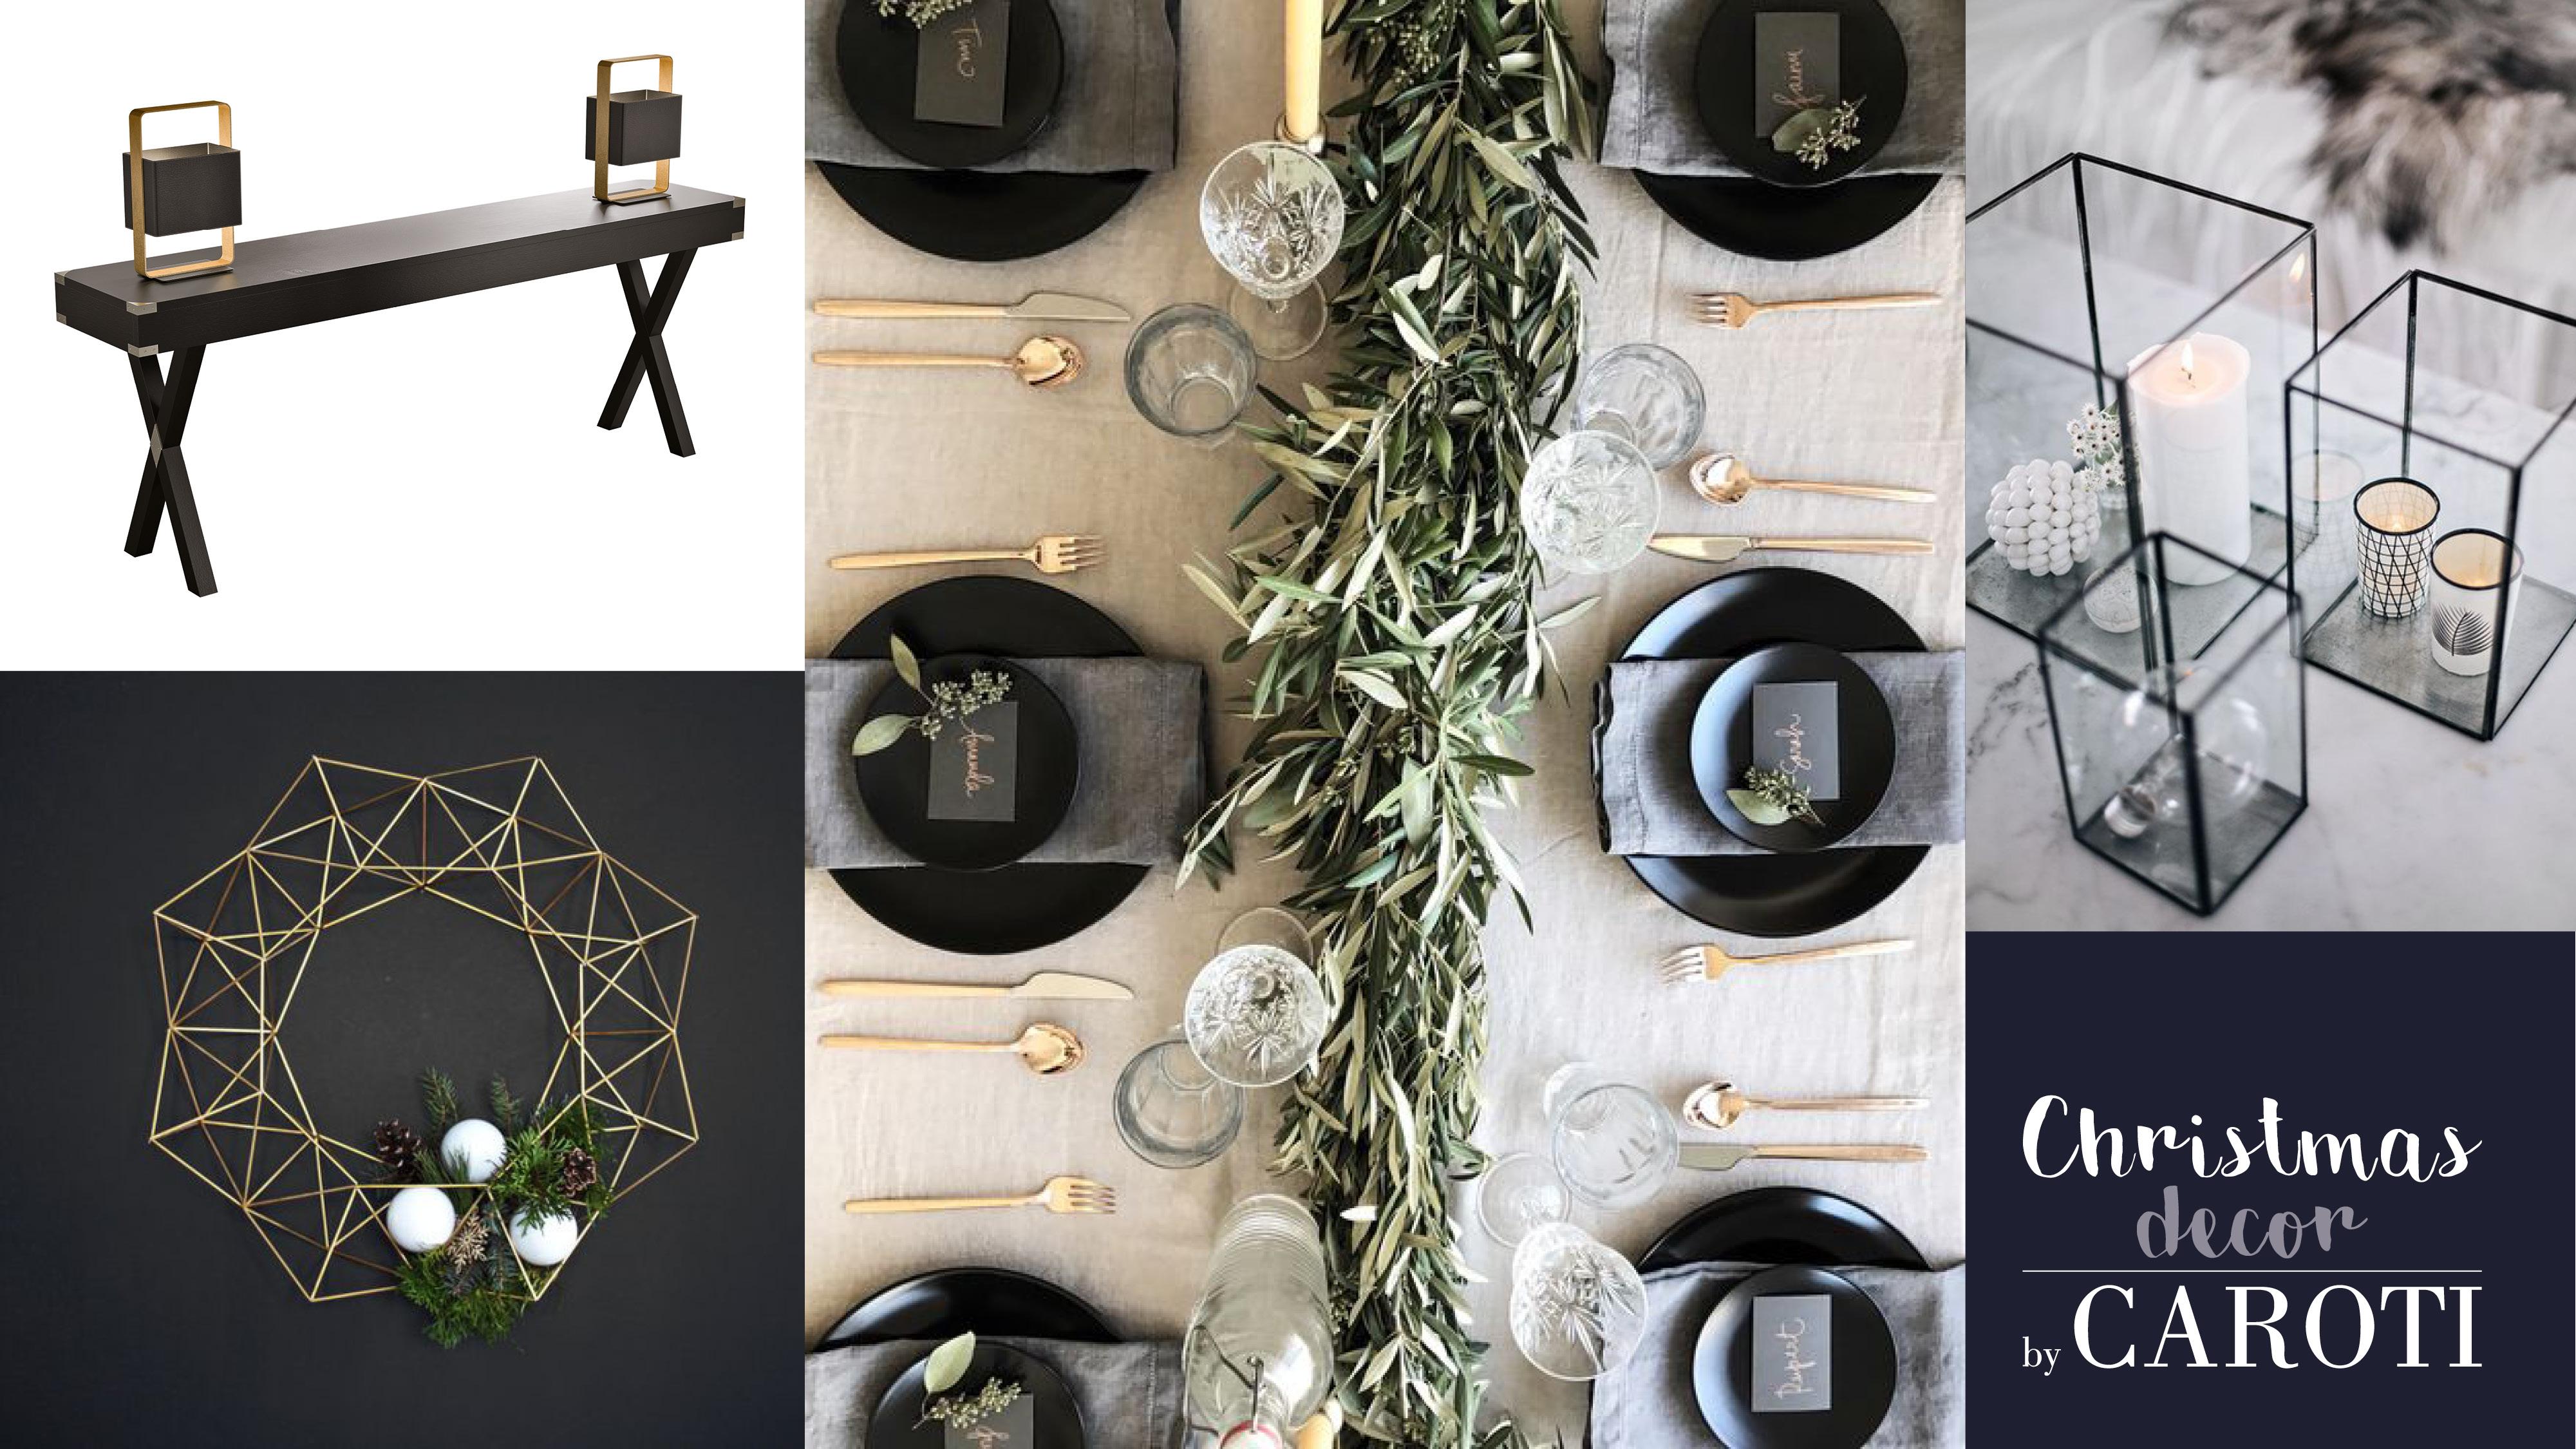 idee per decorare a natale in stile glam black by caroti